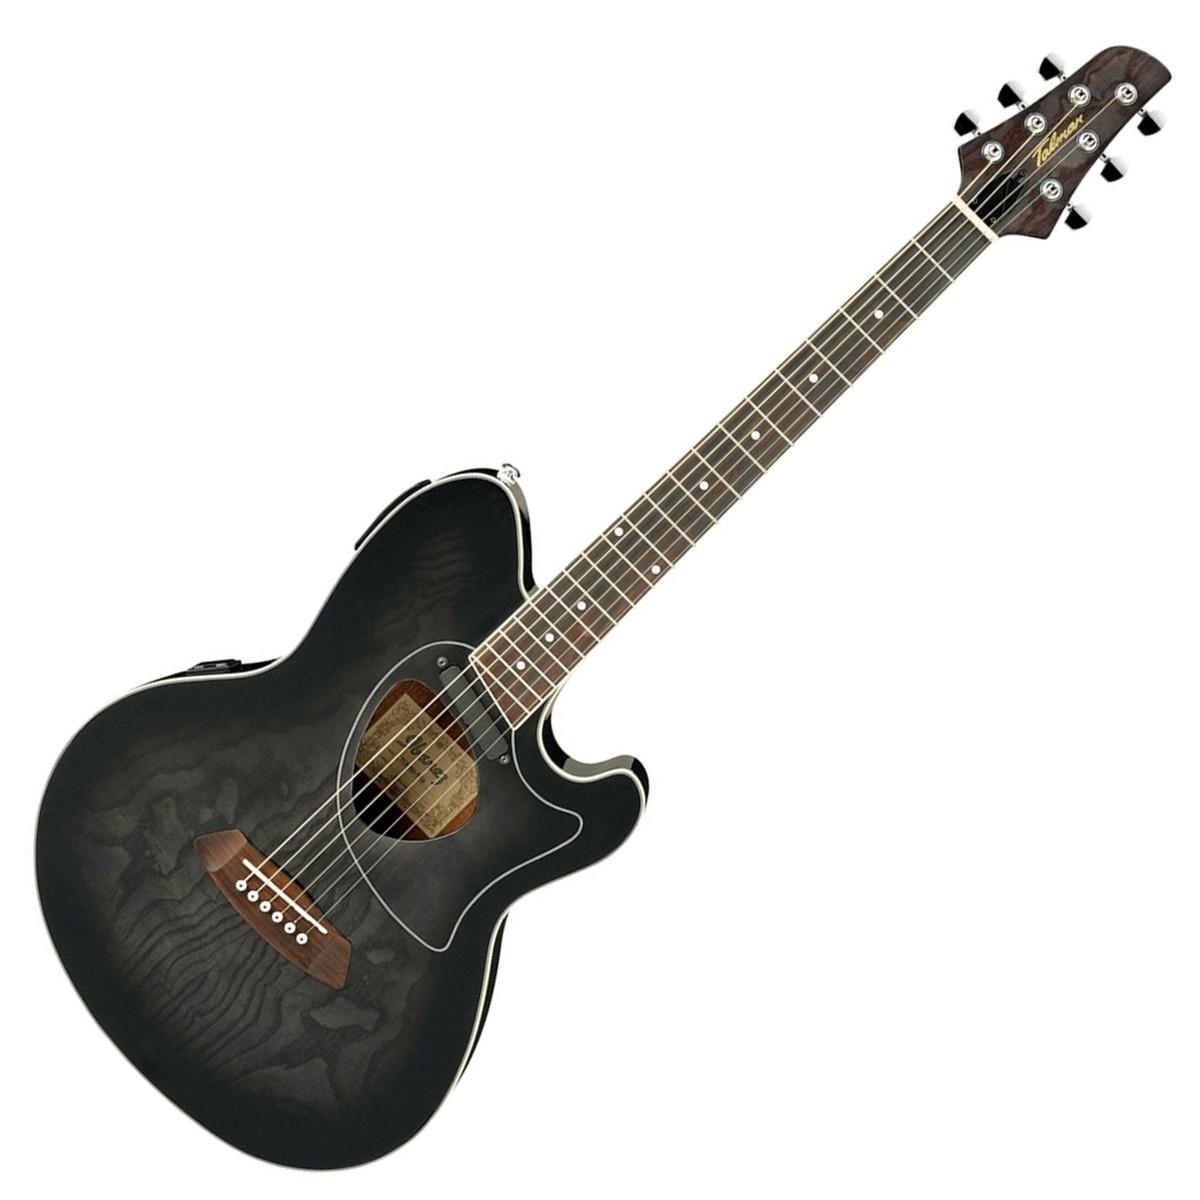 ibanez tcm50 tks talman guitare electro acoustique trans. Black Bedroom Furniture Sets. Home Design Ideas